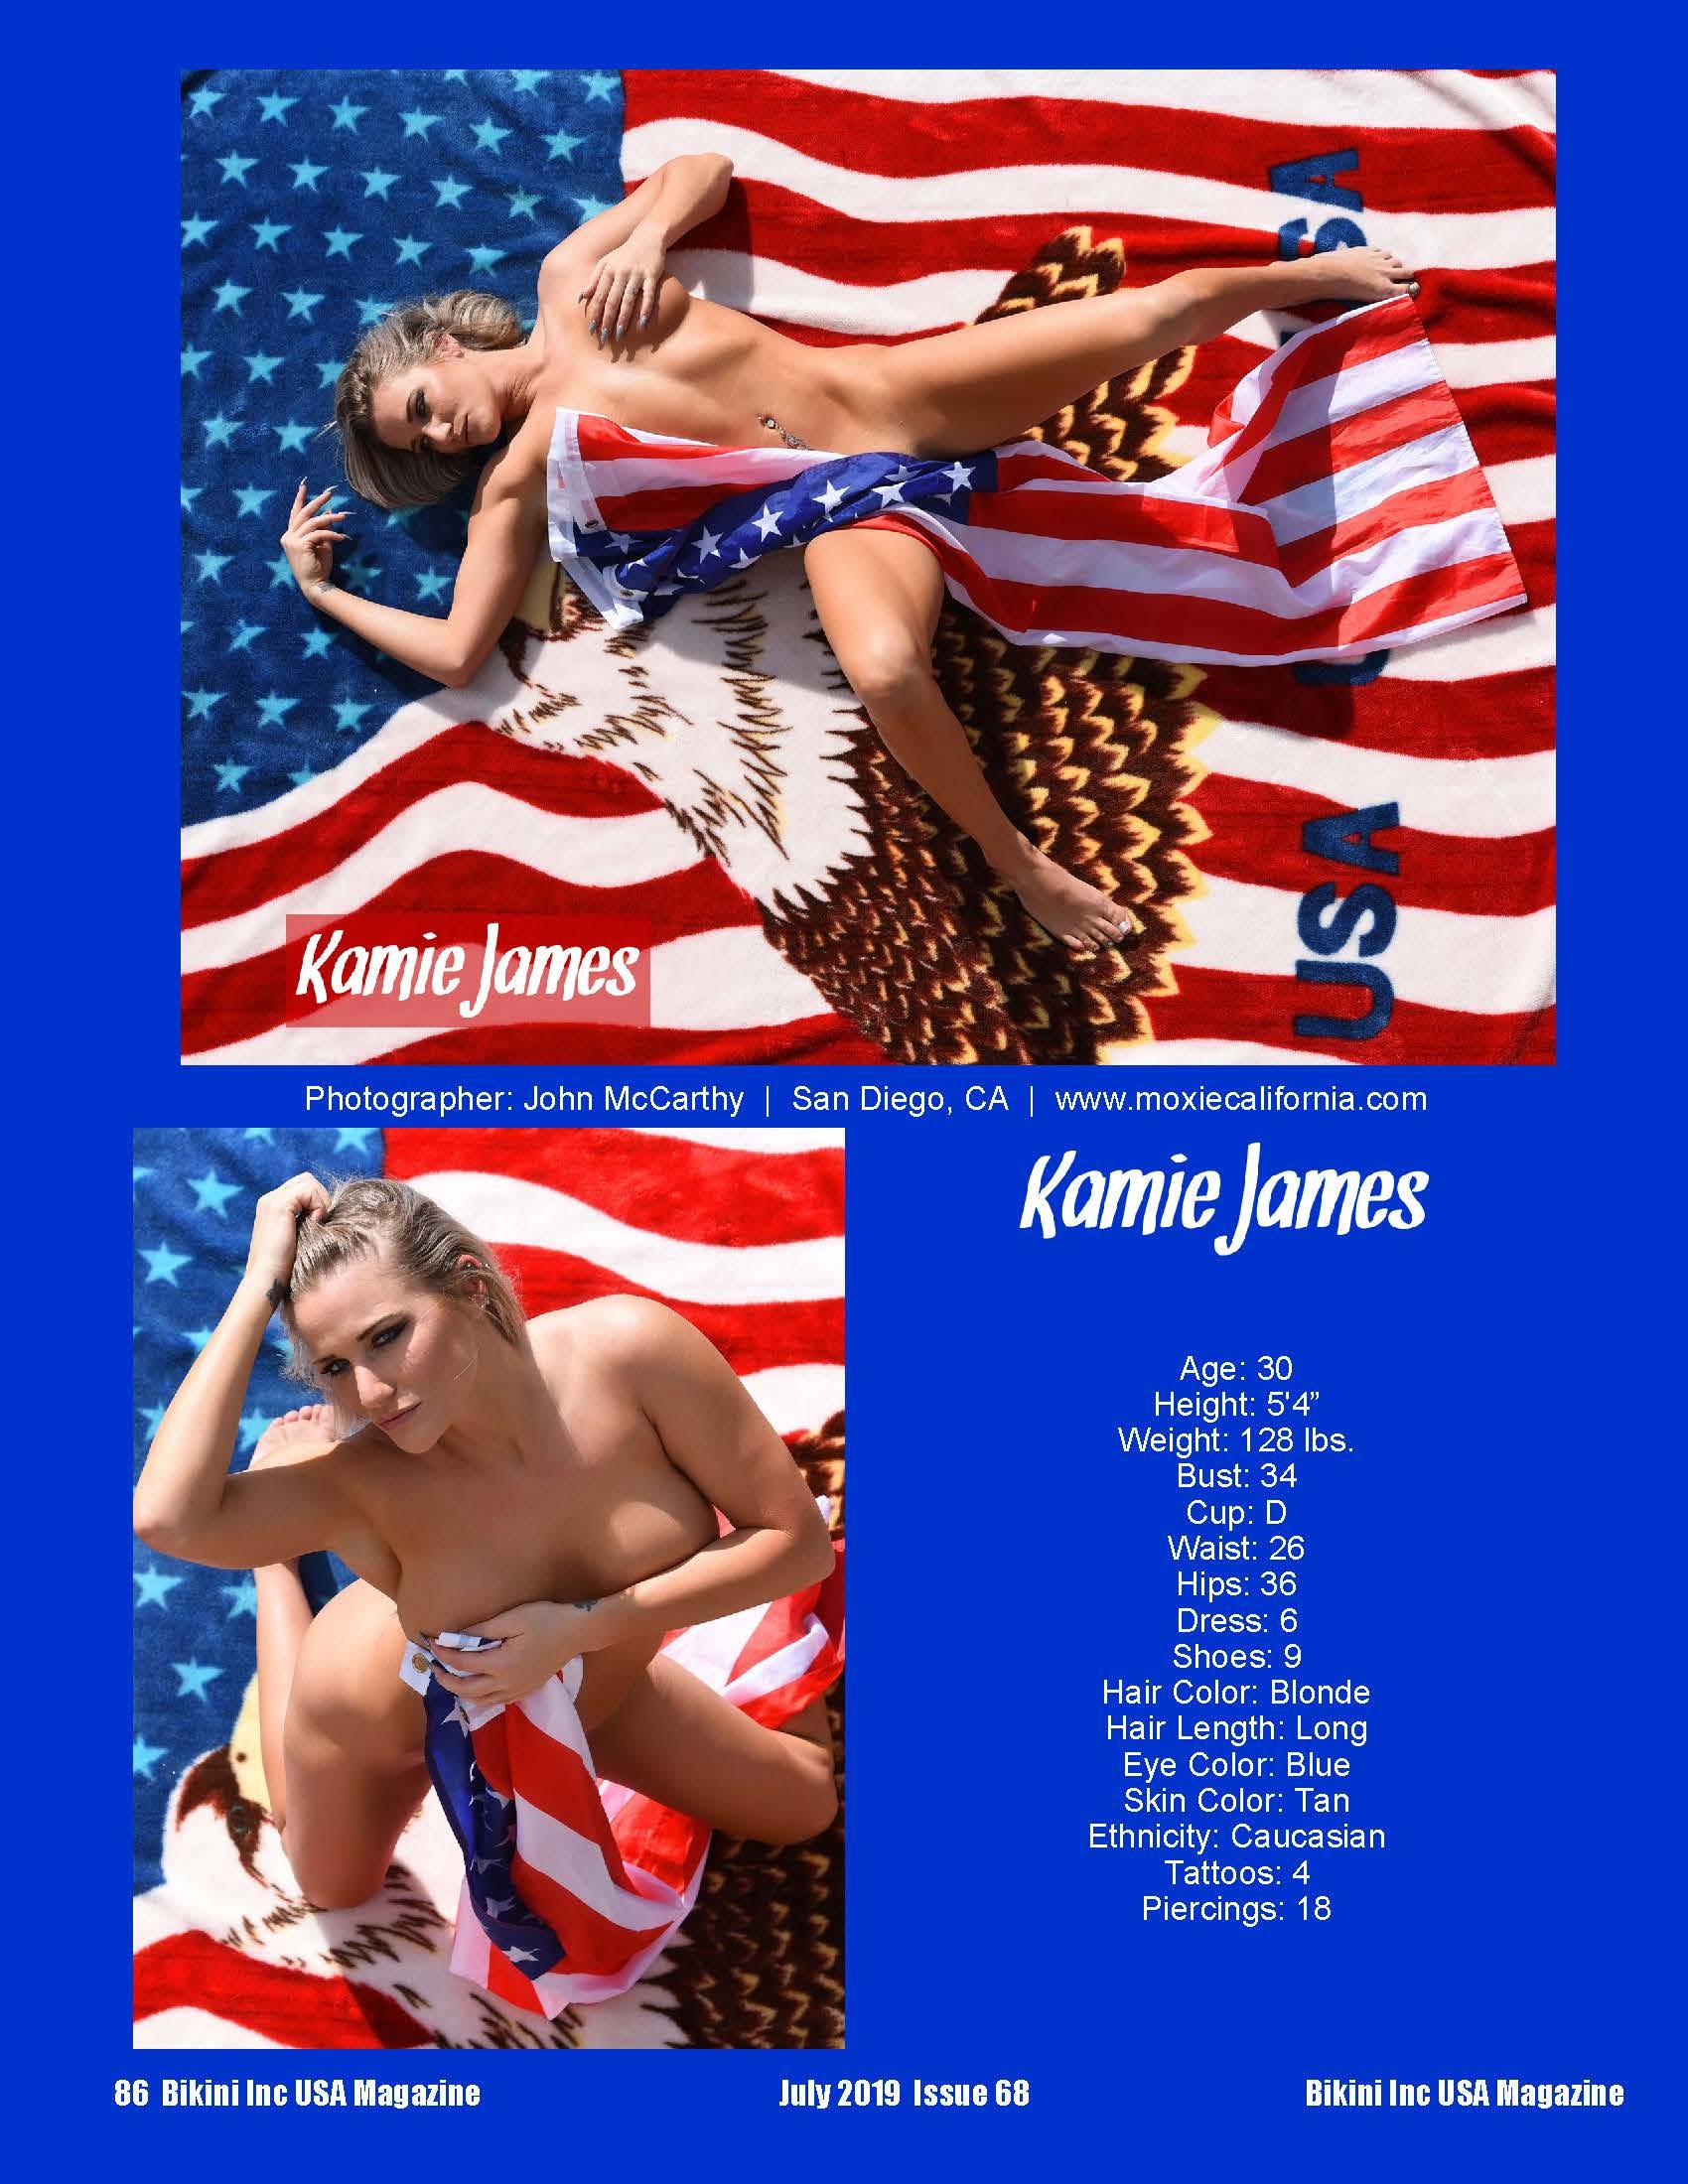 Kamie James - Jul 2019